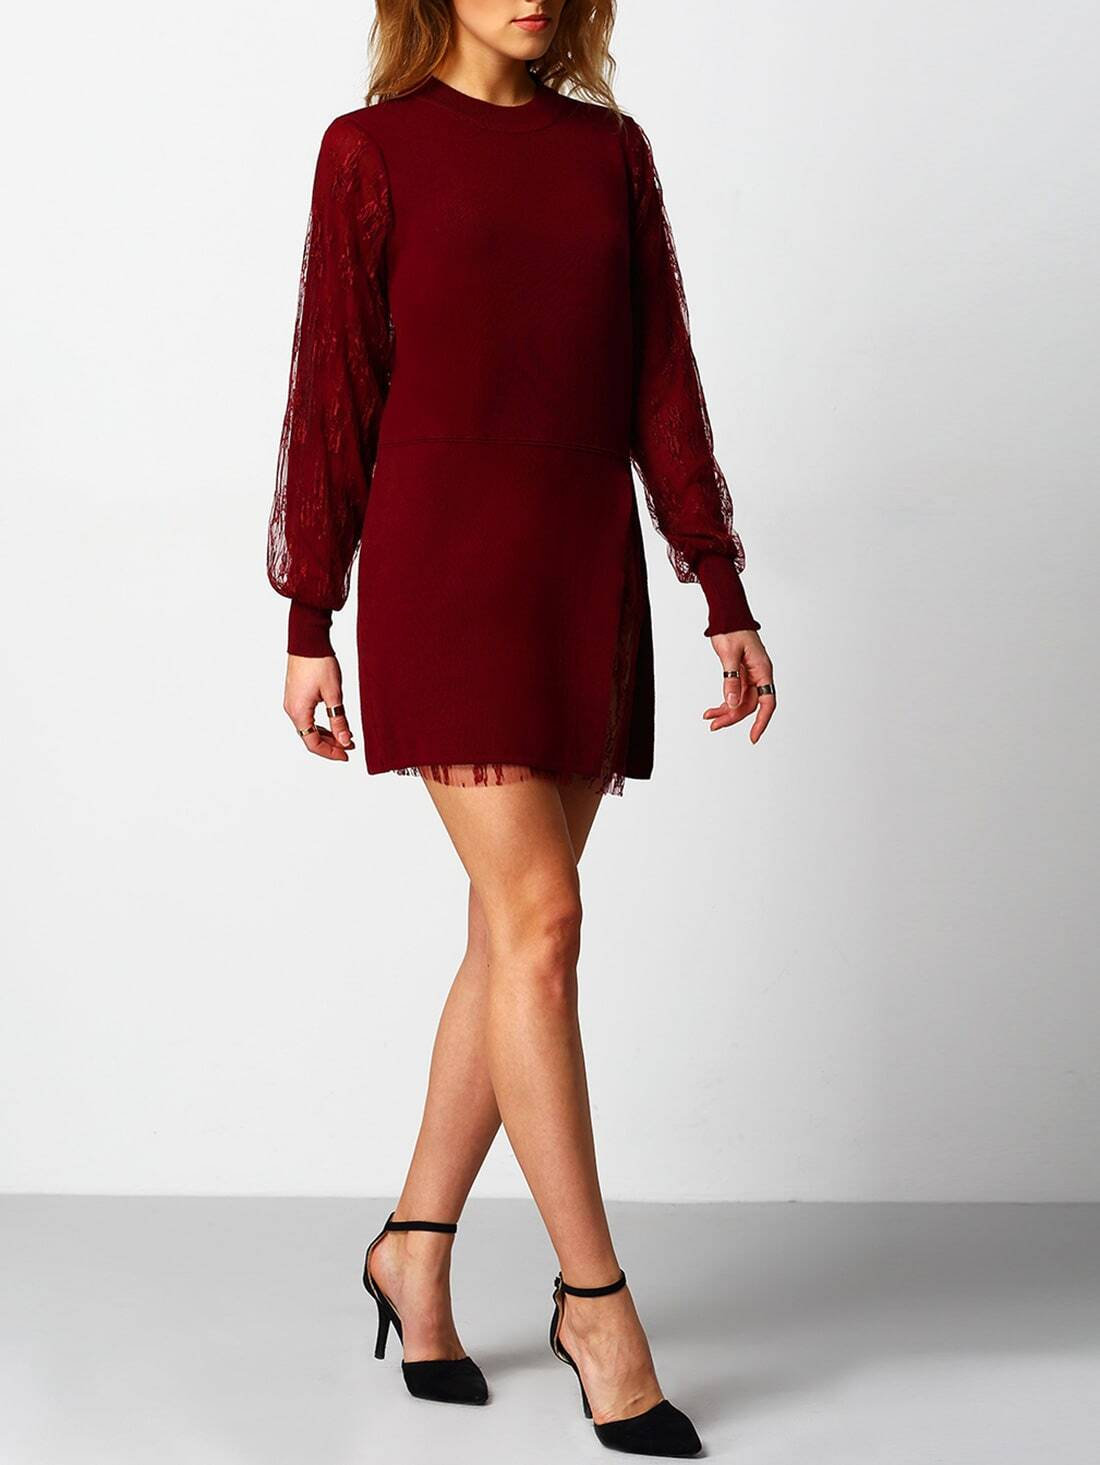 Red Crew Neck Lace Sweater Dress -SheIn(Sheinside)